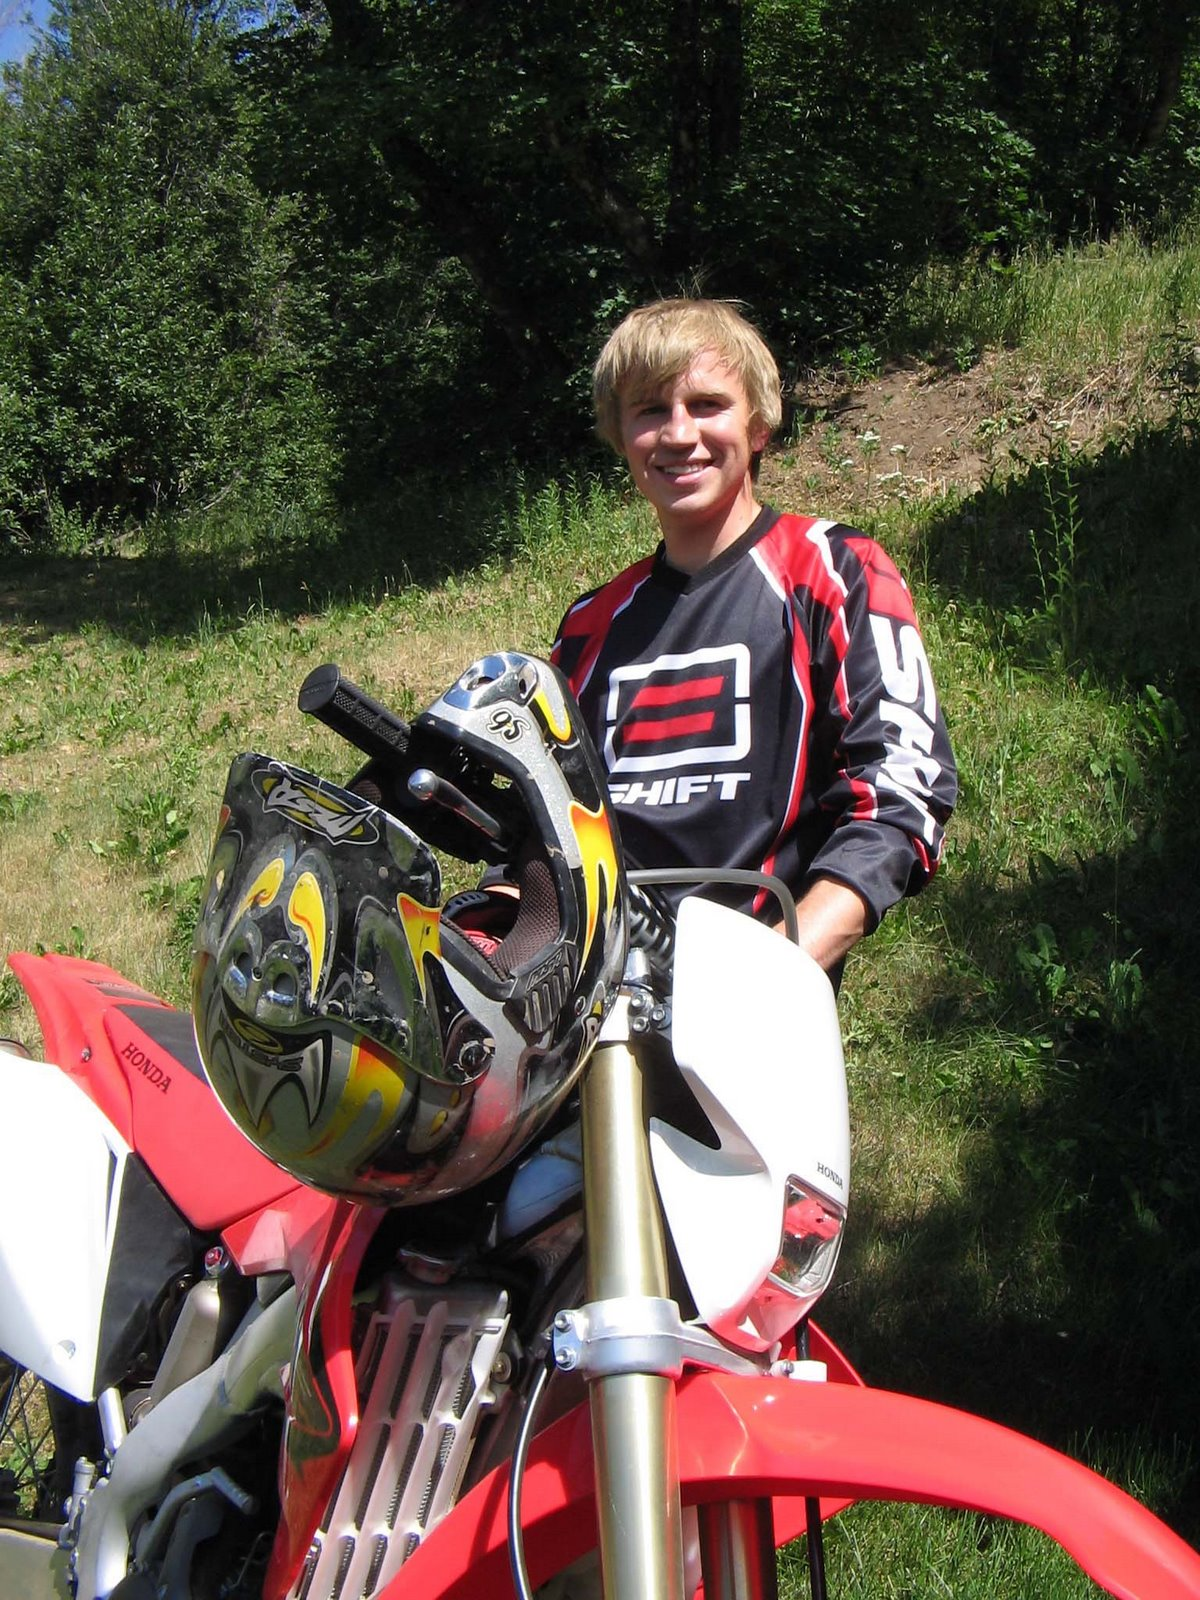 [Sam+and+bike]